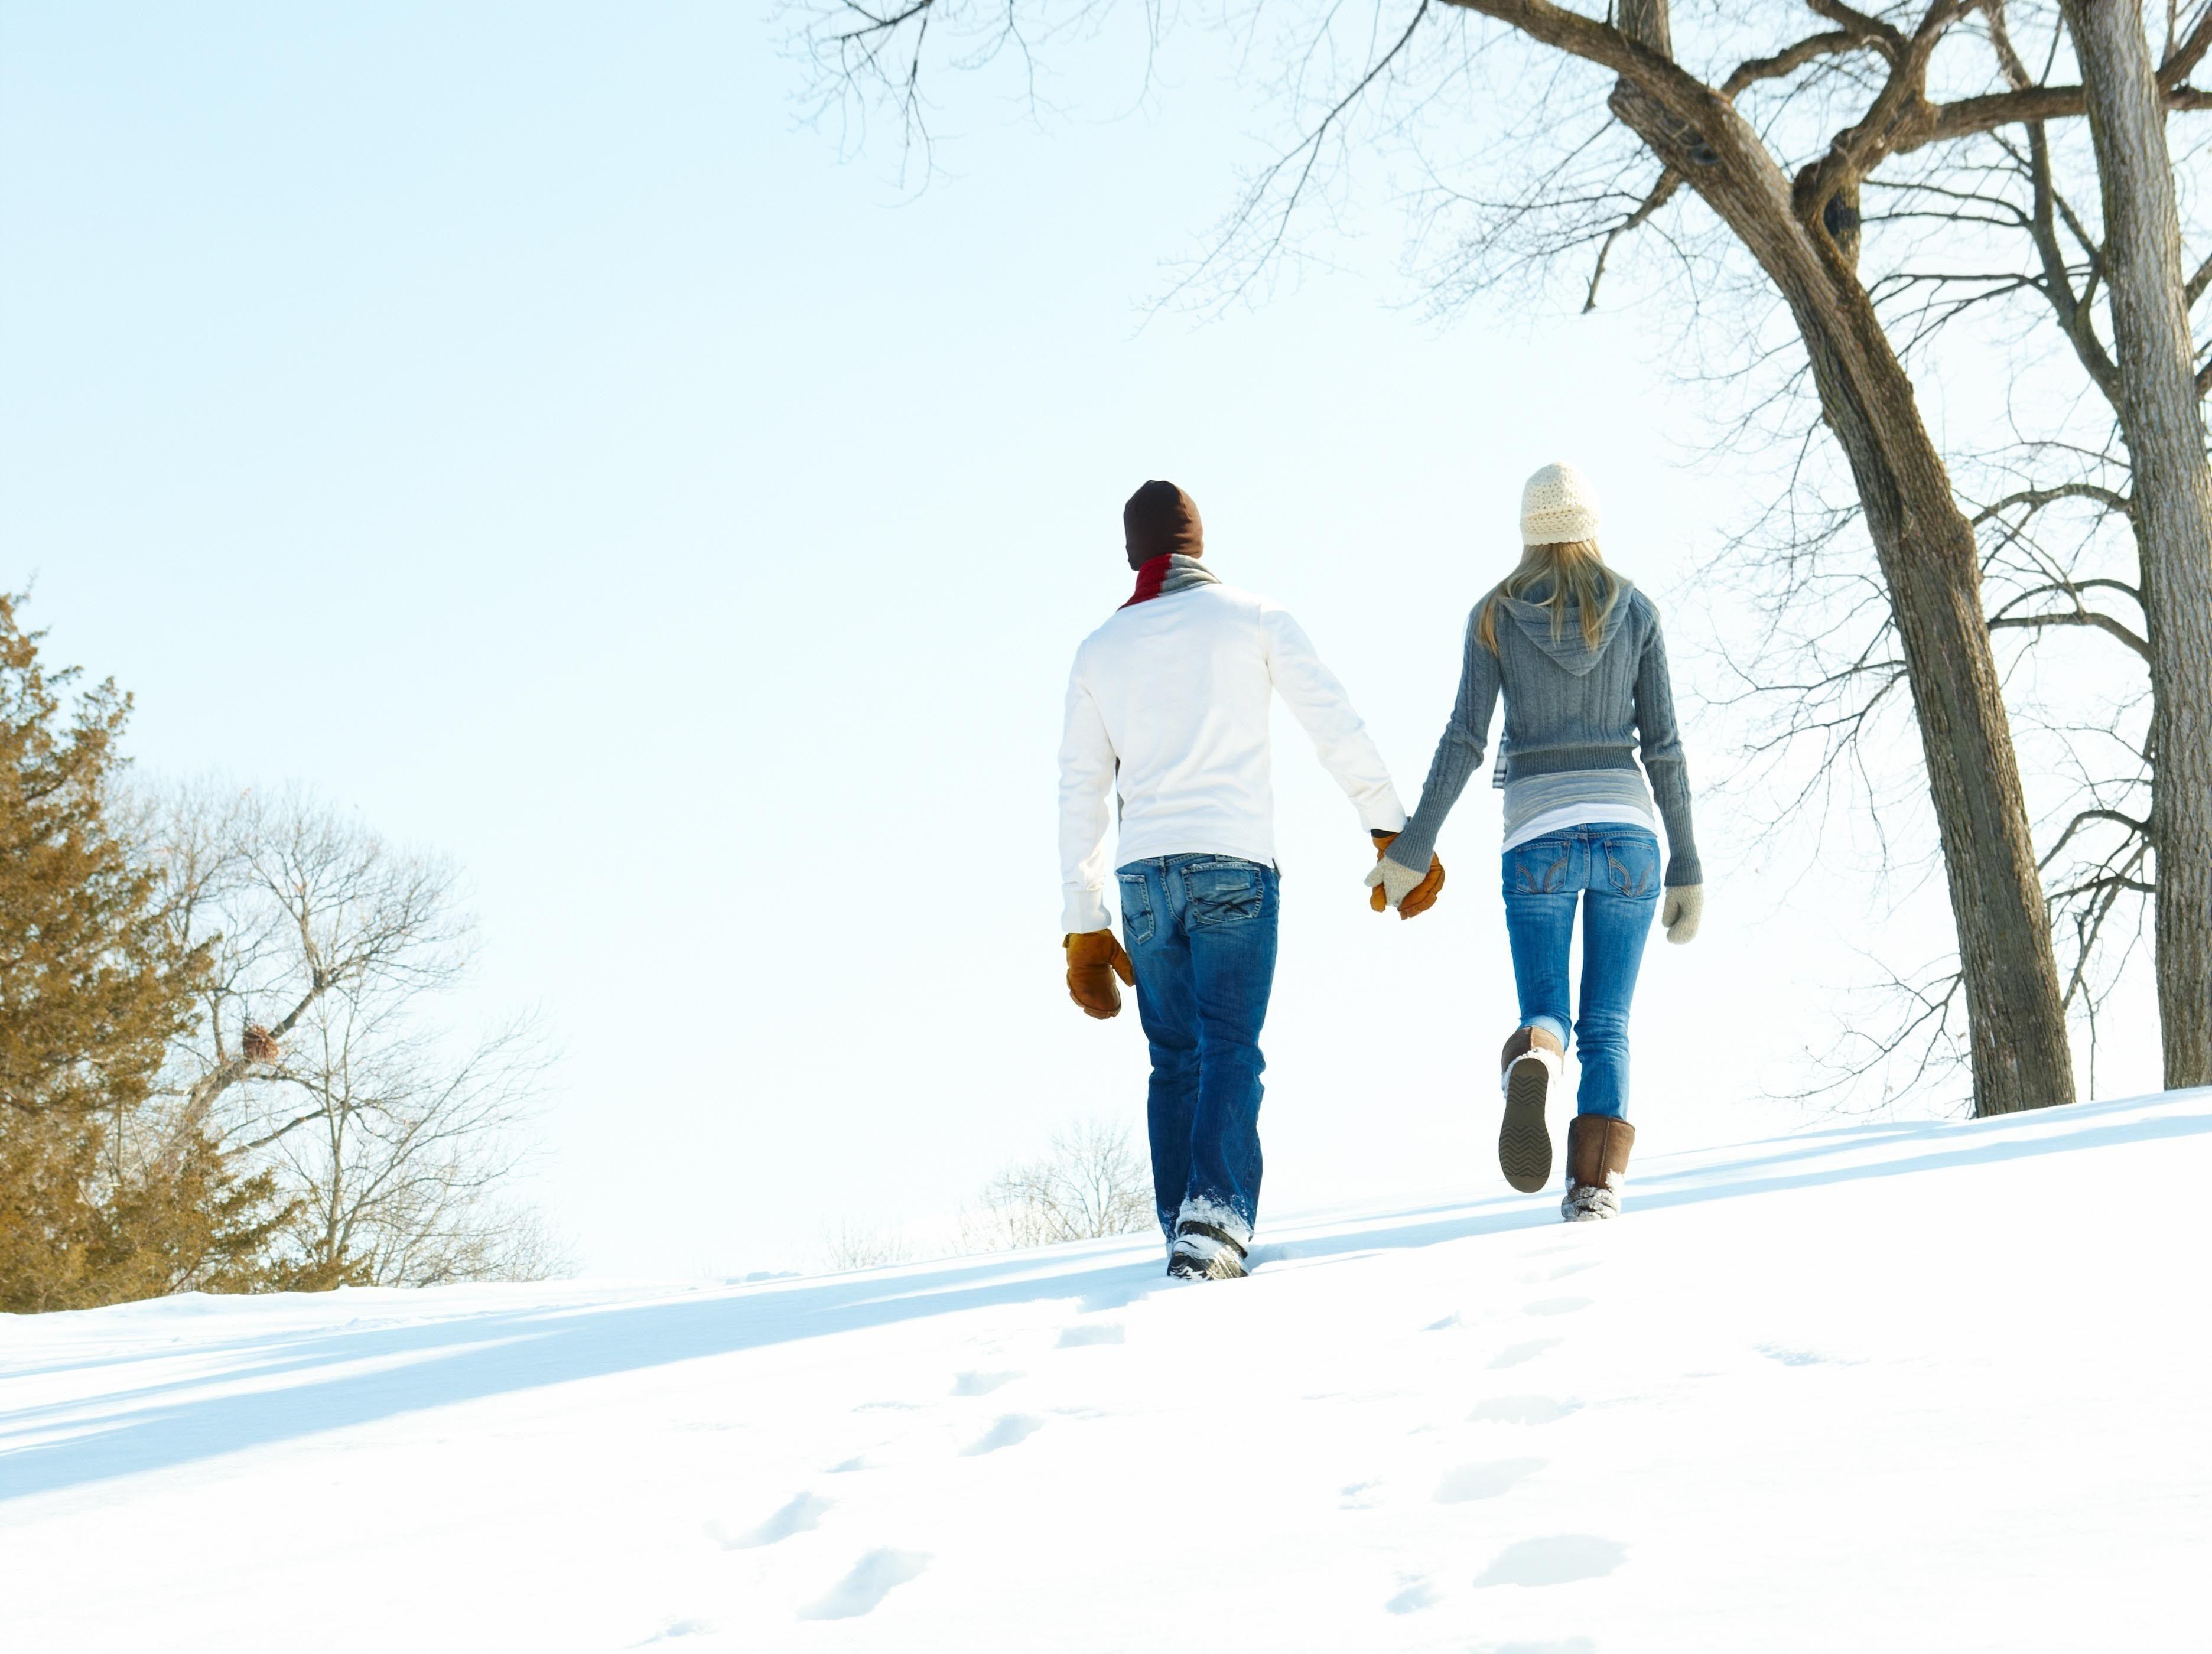 Зима романтика фото 5